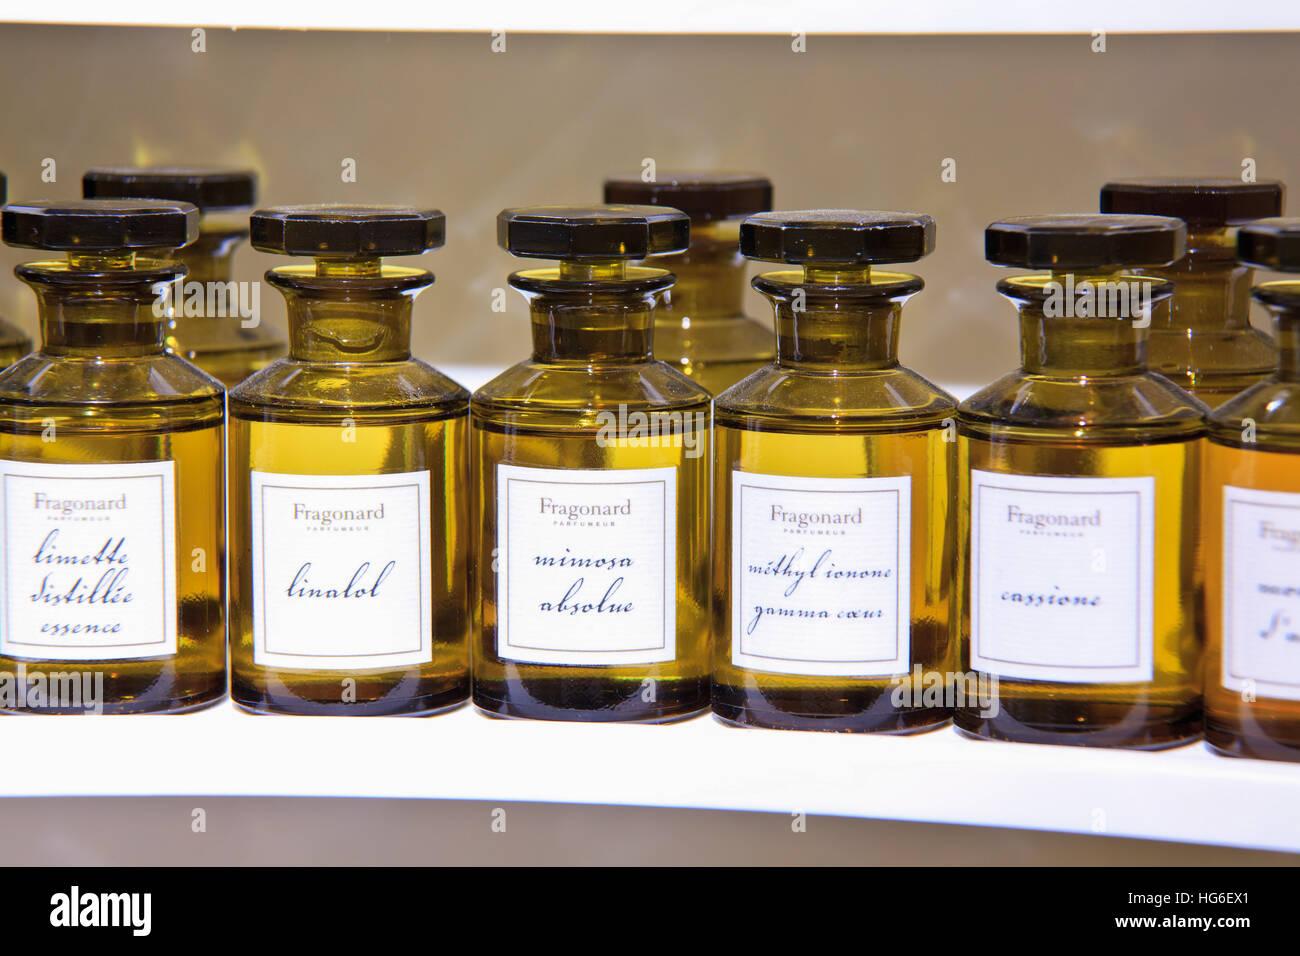 grasse france perfume stock photos grasse france perfume. Black Bedroom Furniture Sets. Home Design Ideas